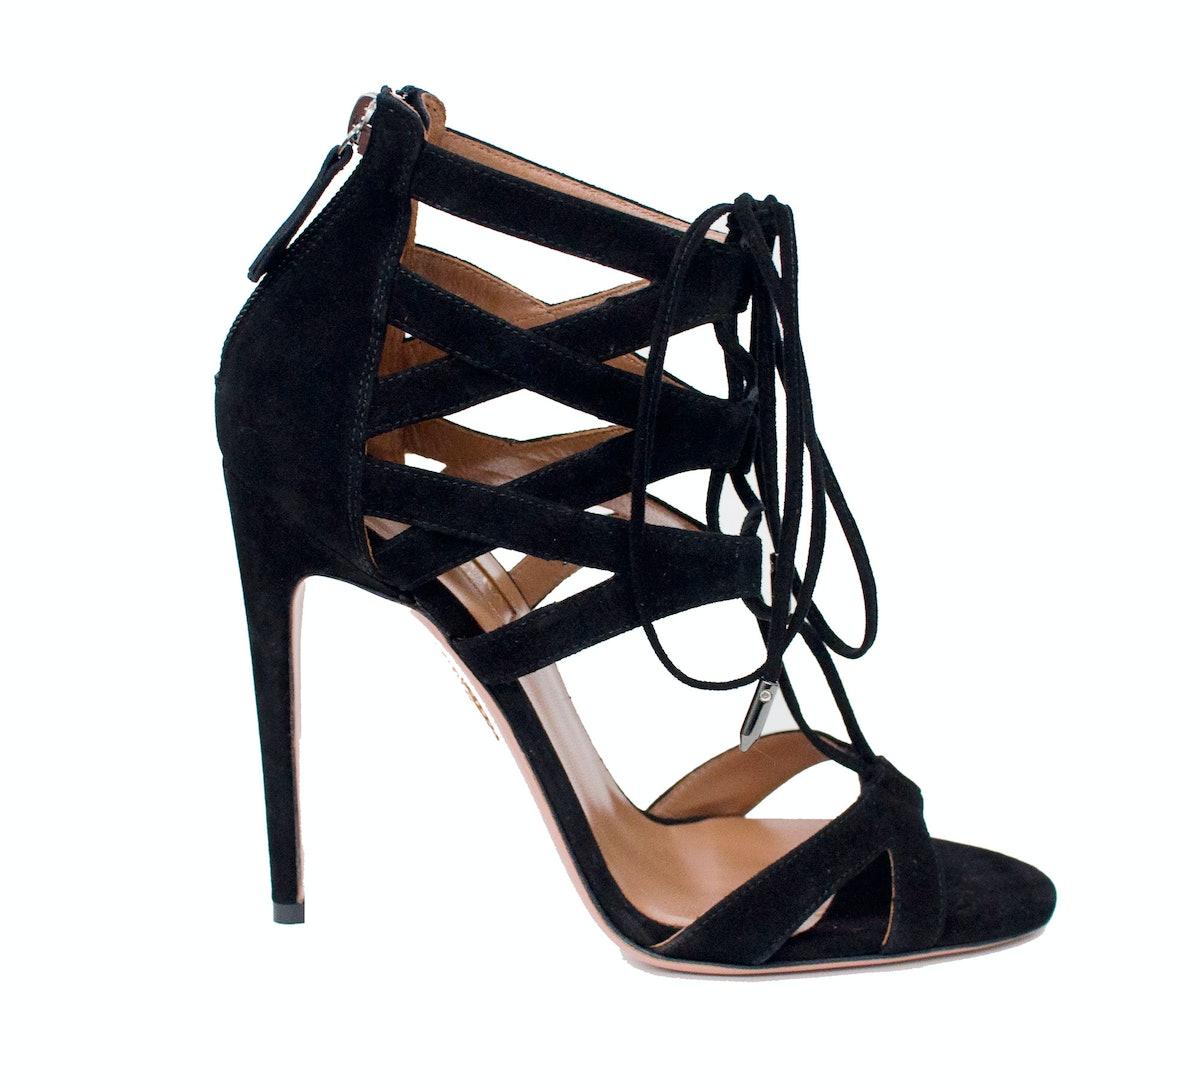 Aquazzura sandals, $745, [saks.com](http://rstyle.me/n/dkspm3w3n).